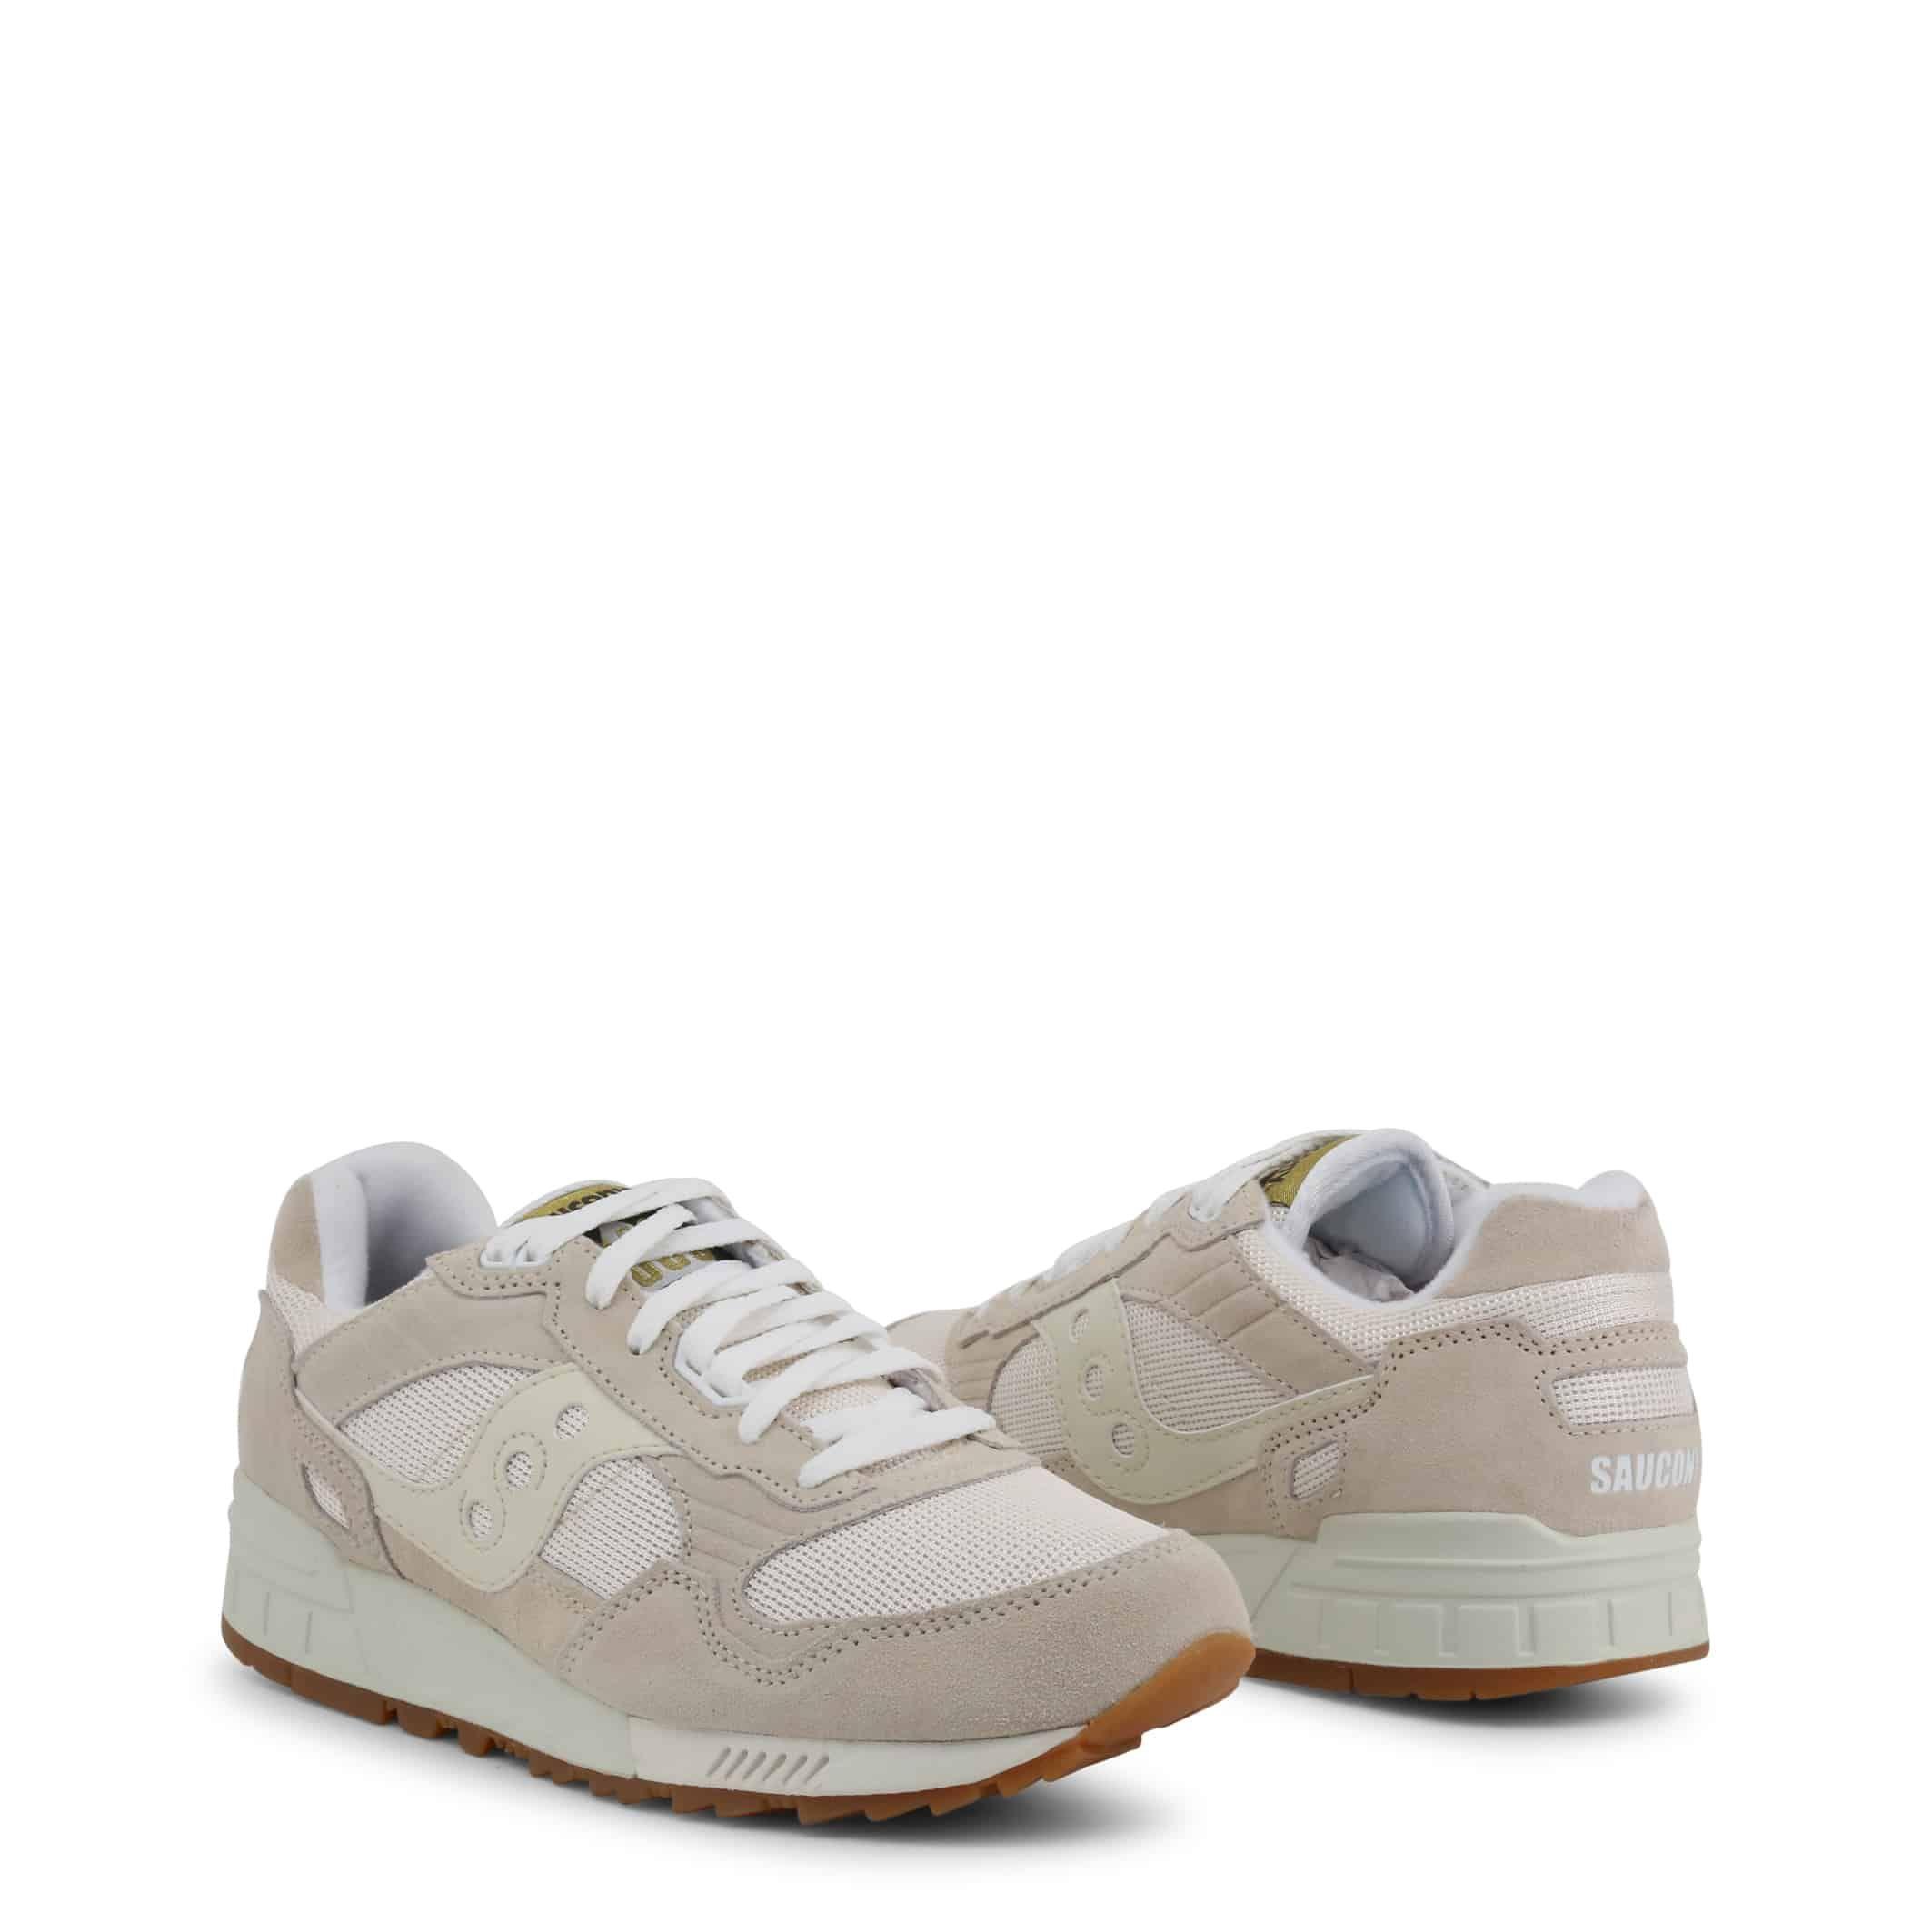 Sneakers Saucony – SHADOW-5000